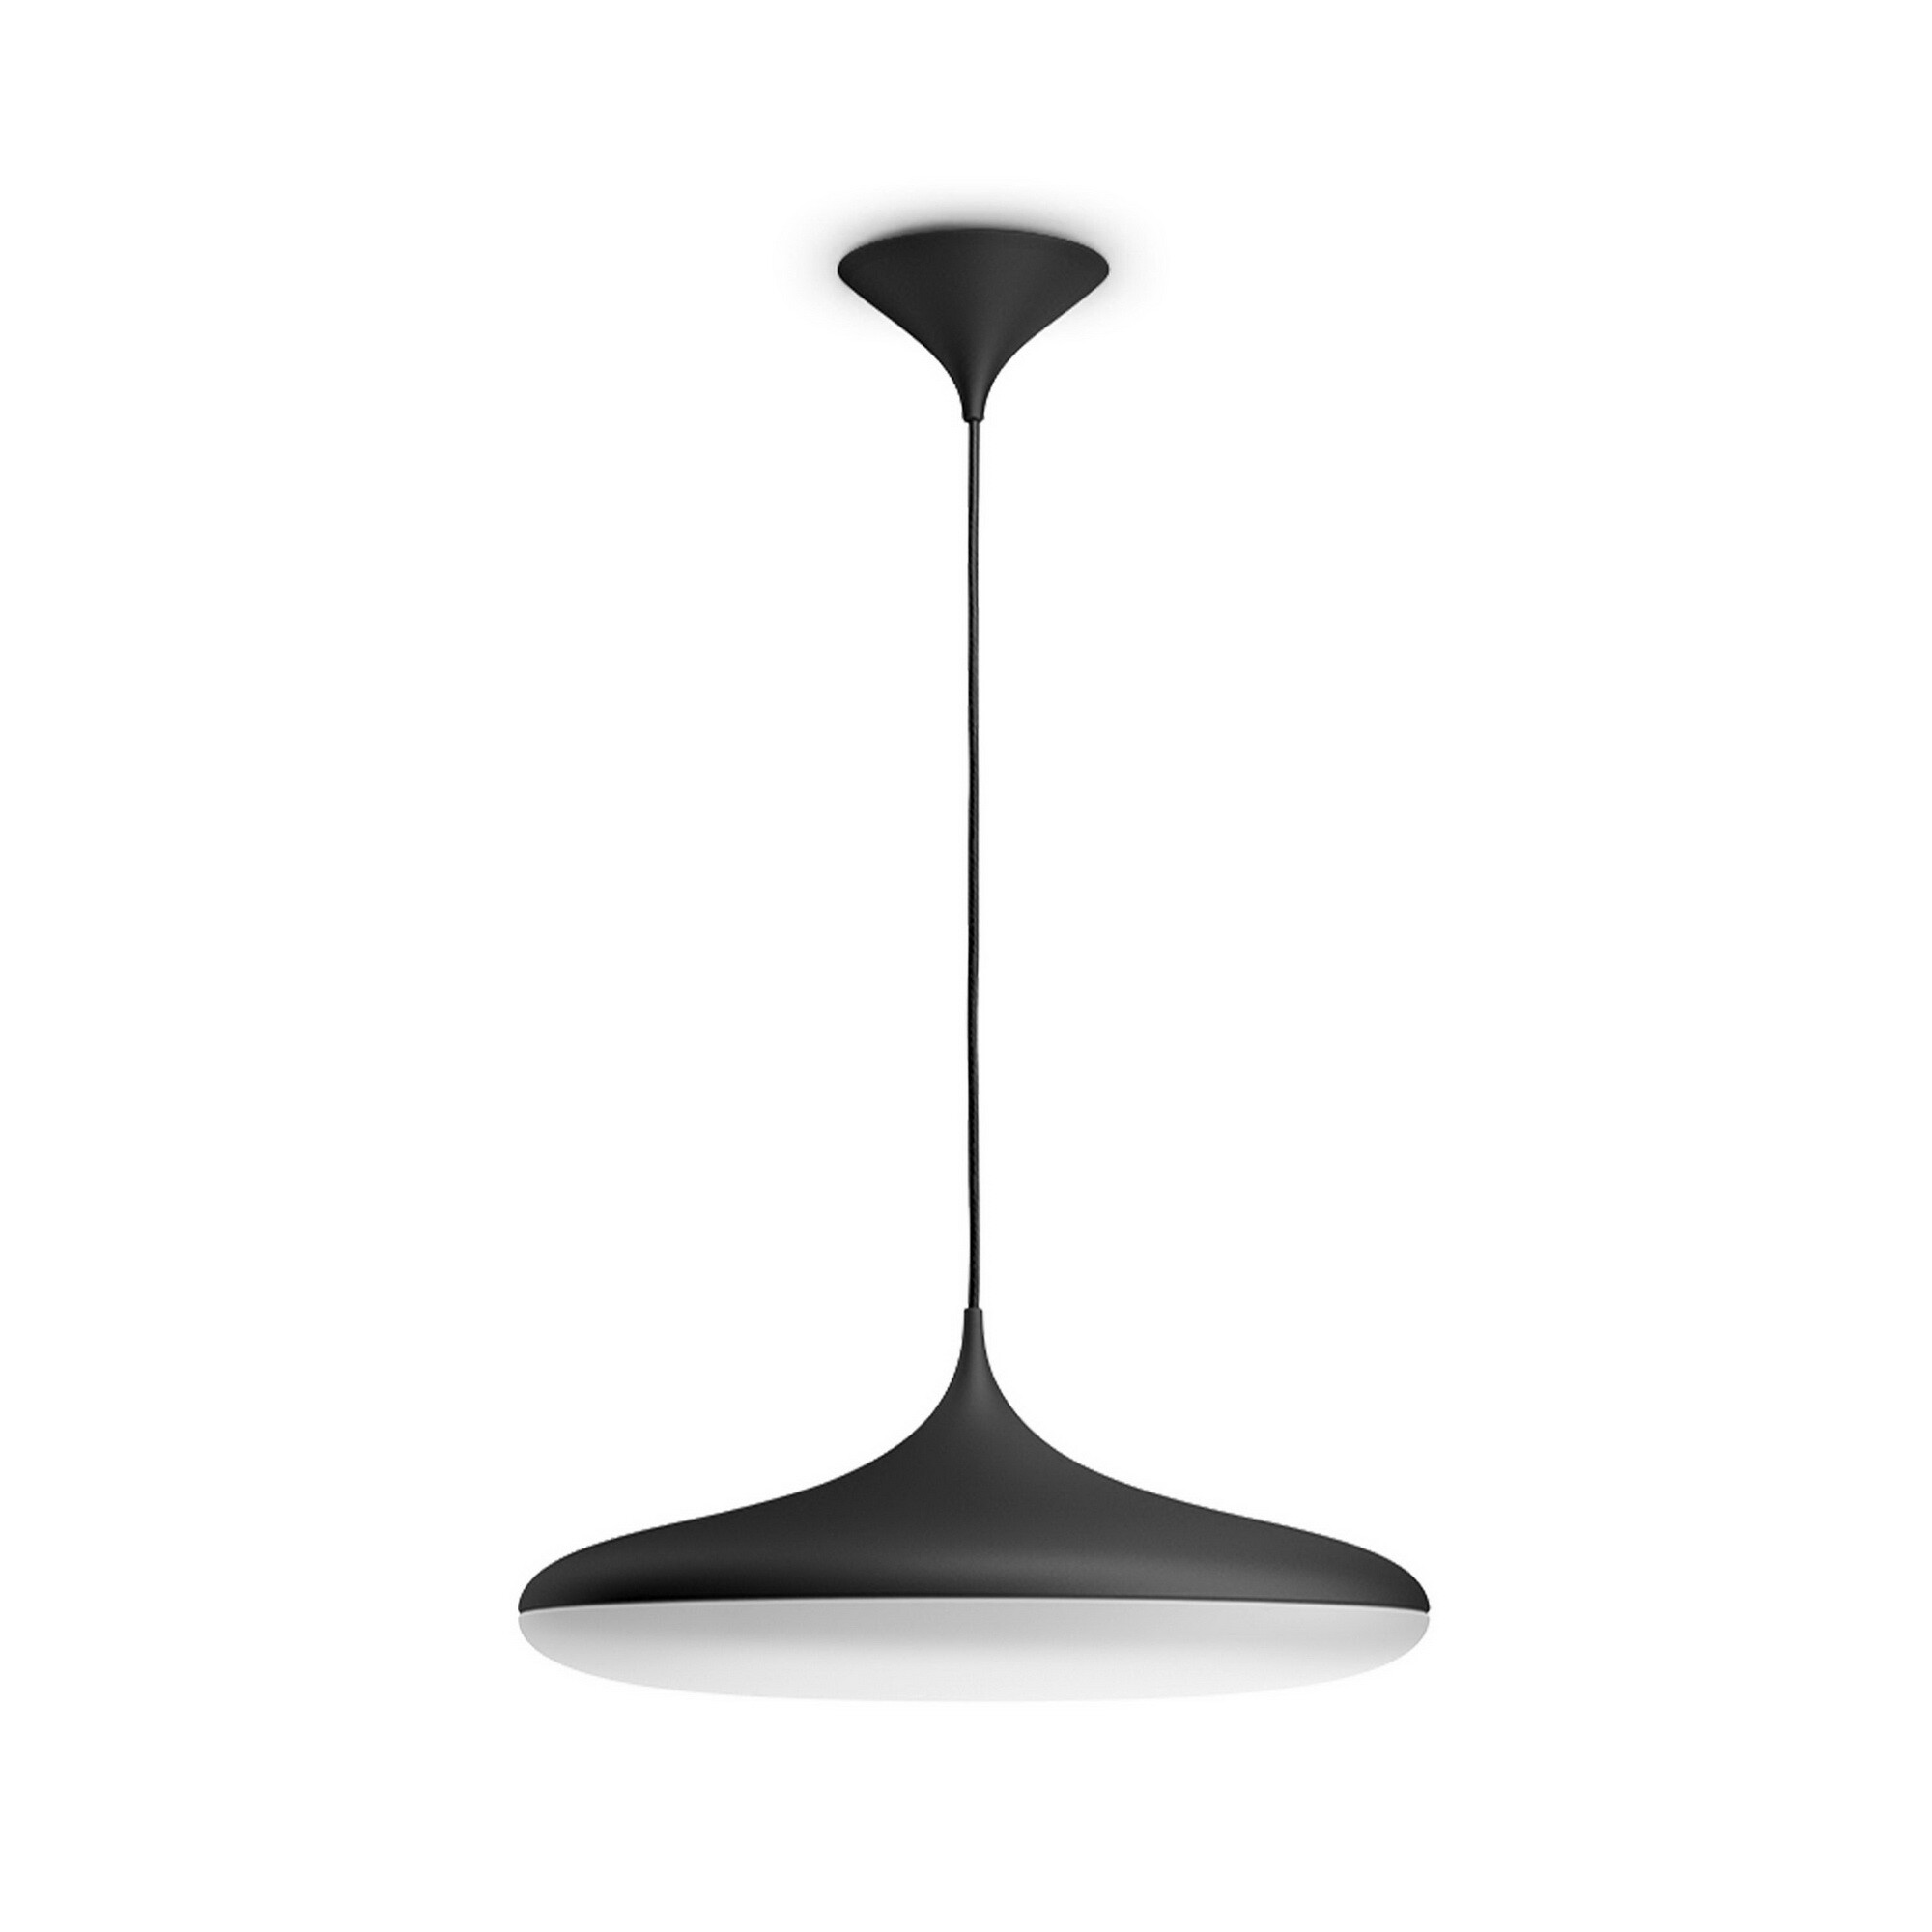 Philips HUE CHER Hanglamp LED 1x34W/3000lm Zwart